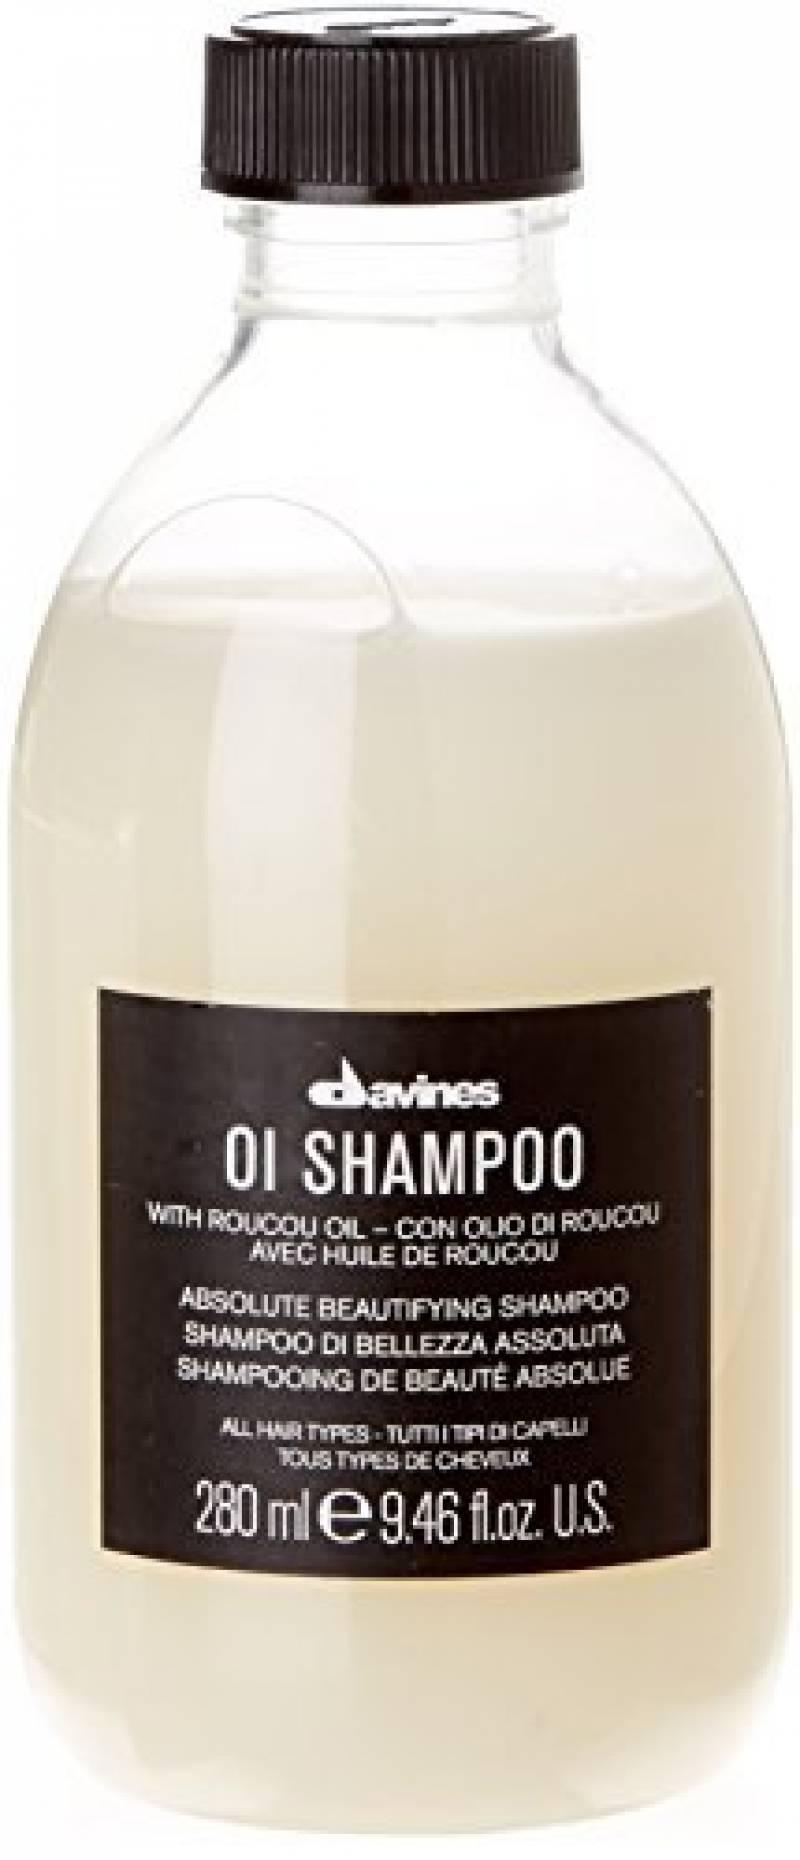 Davines Oi Shampooing 280 ml de la marque Davines TOP 9 image 0 produit